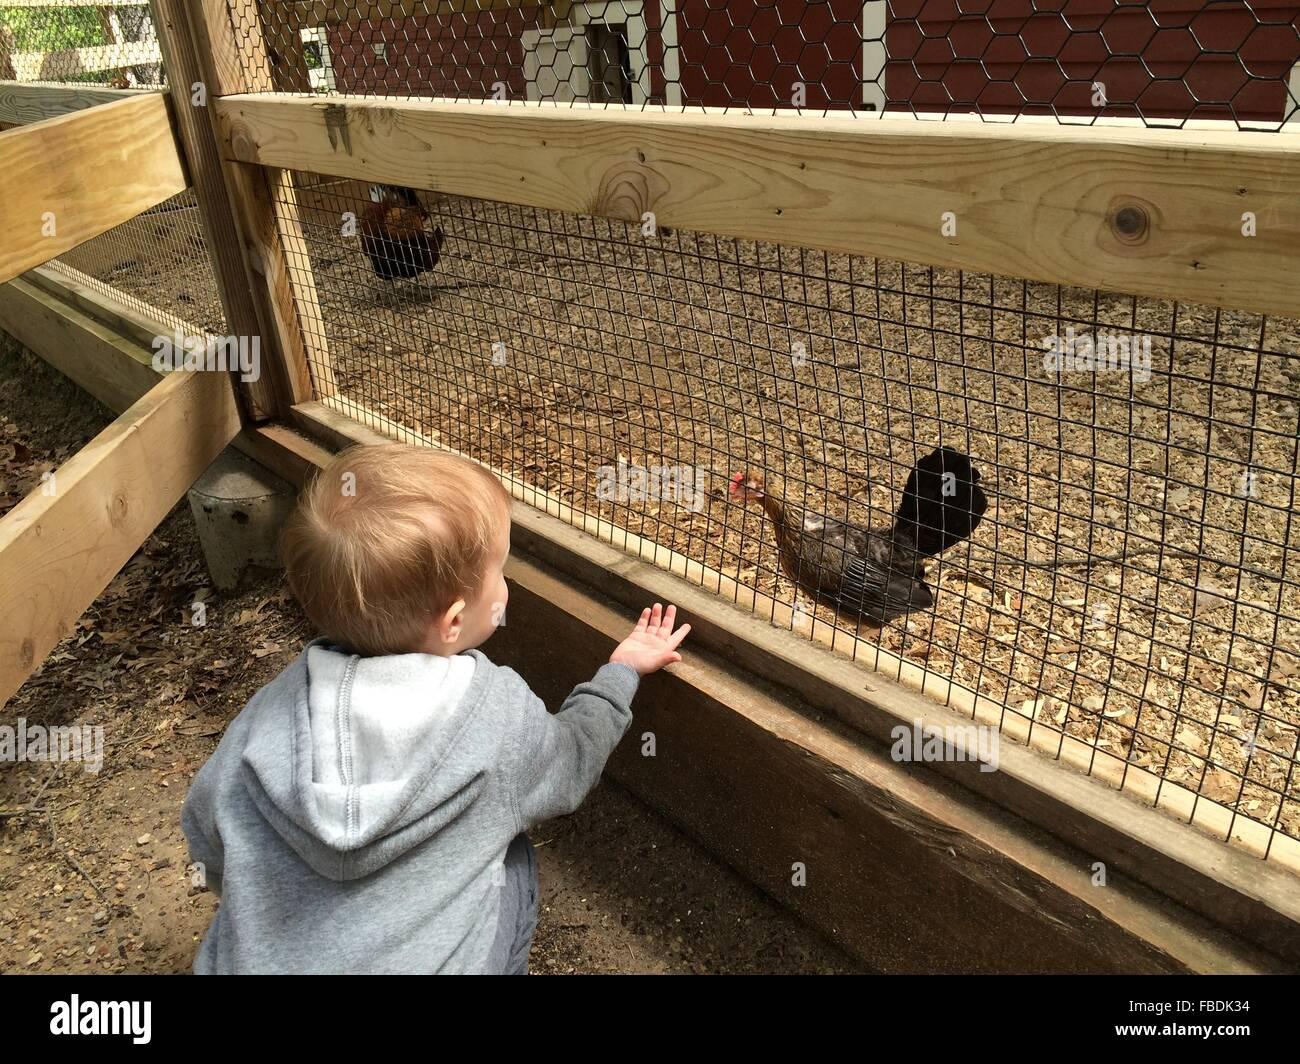 Boy Watching Hen In Poultry Farm - Stock Image